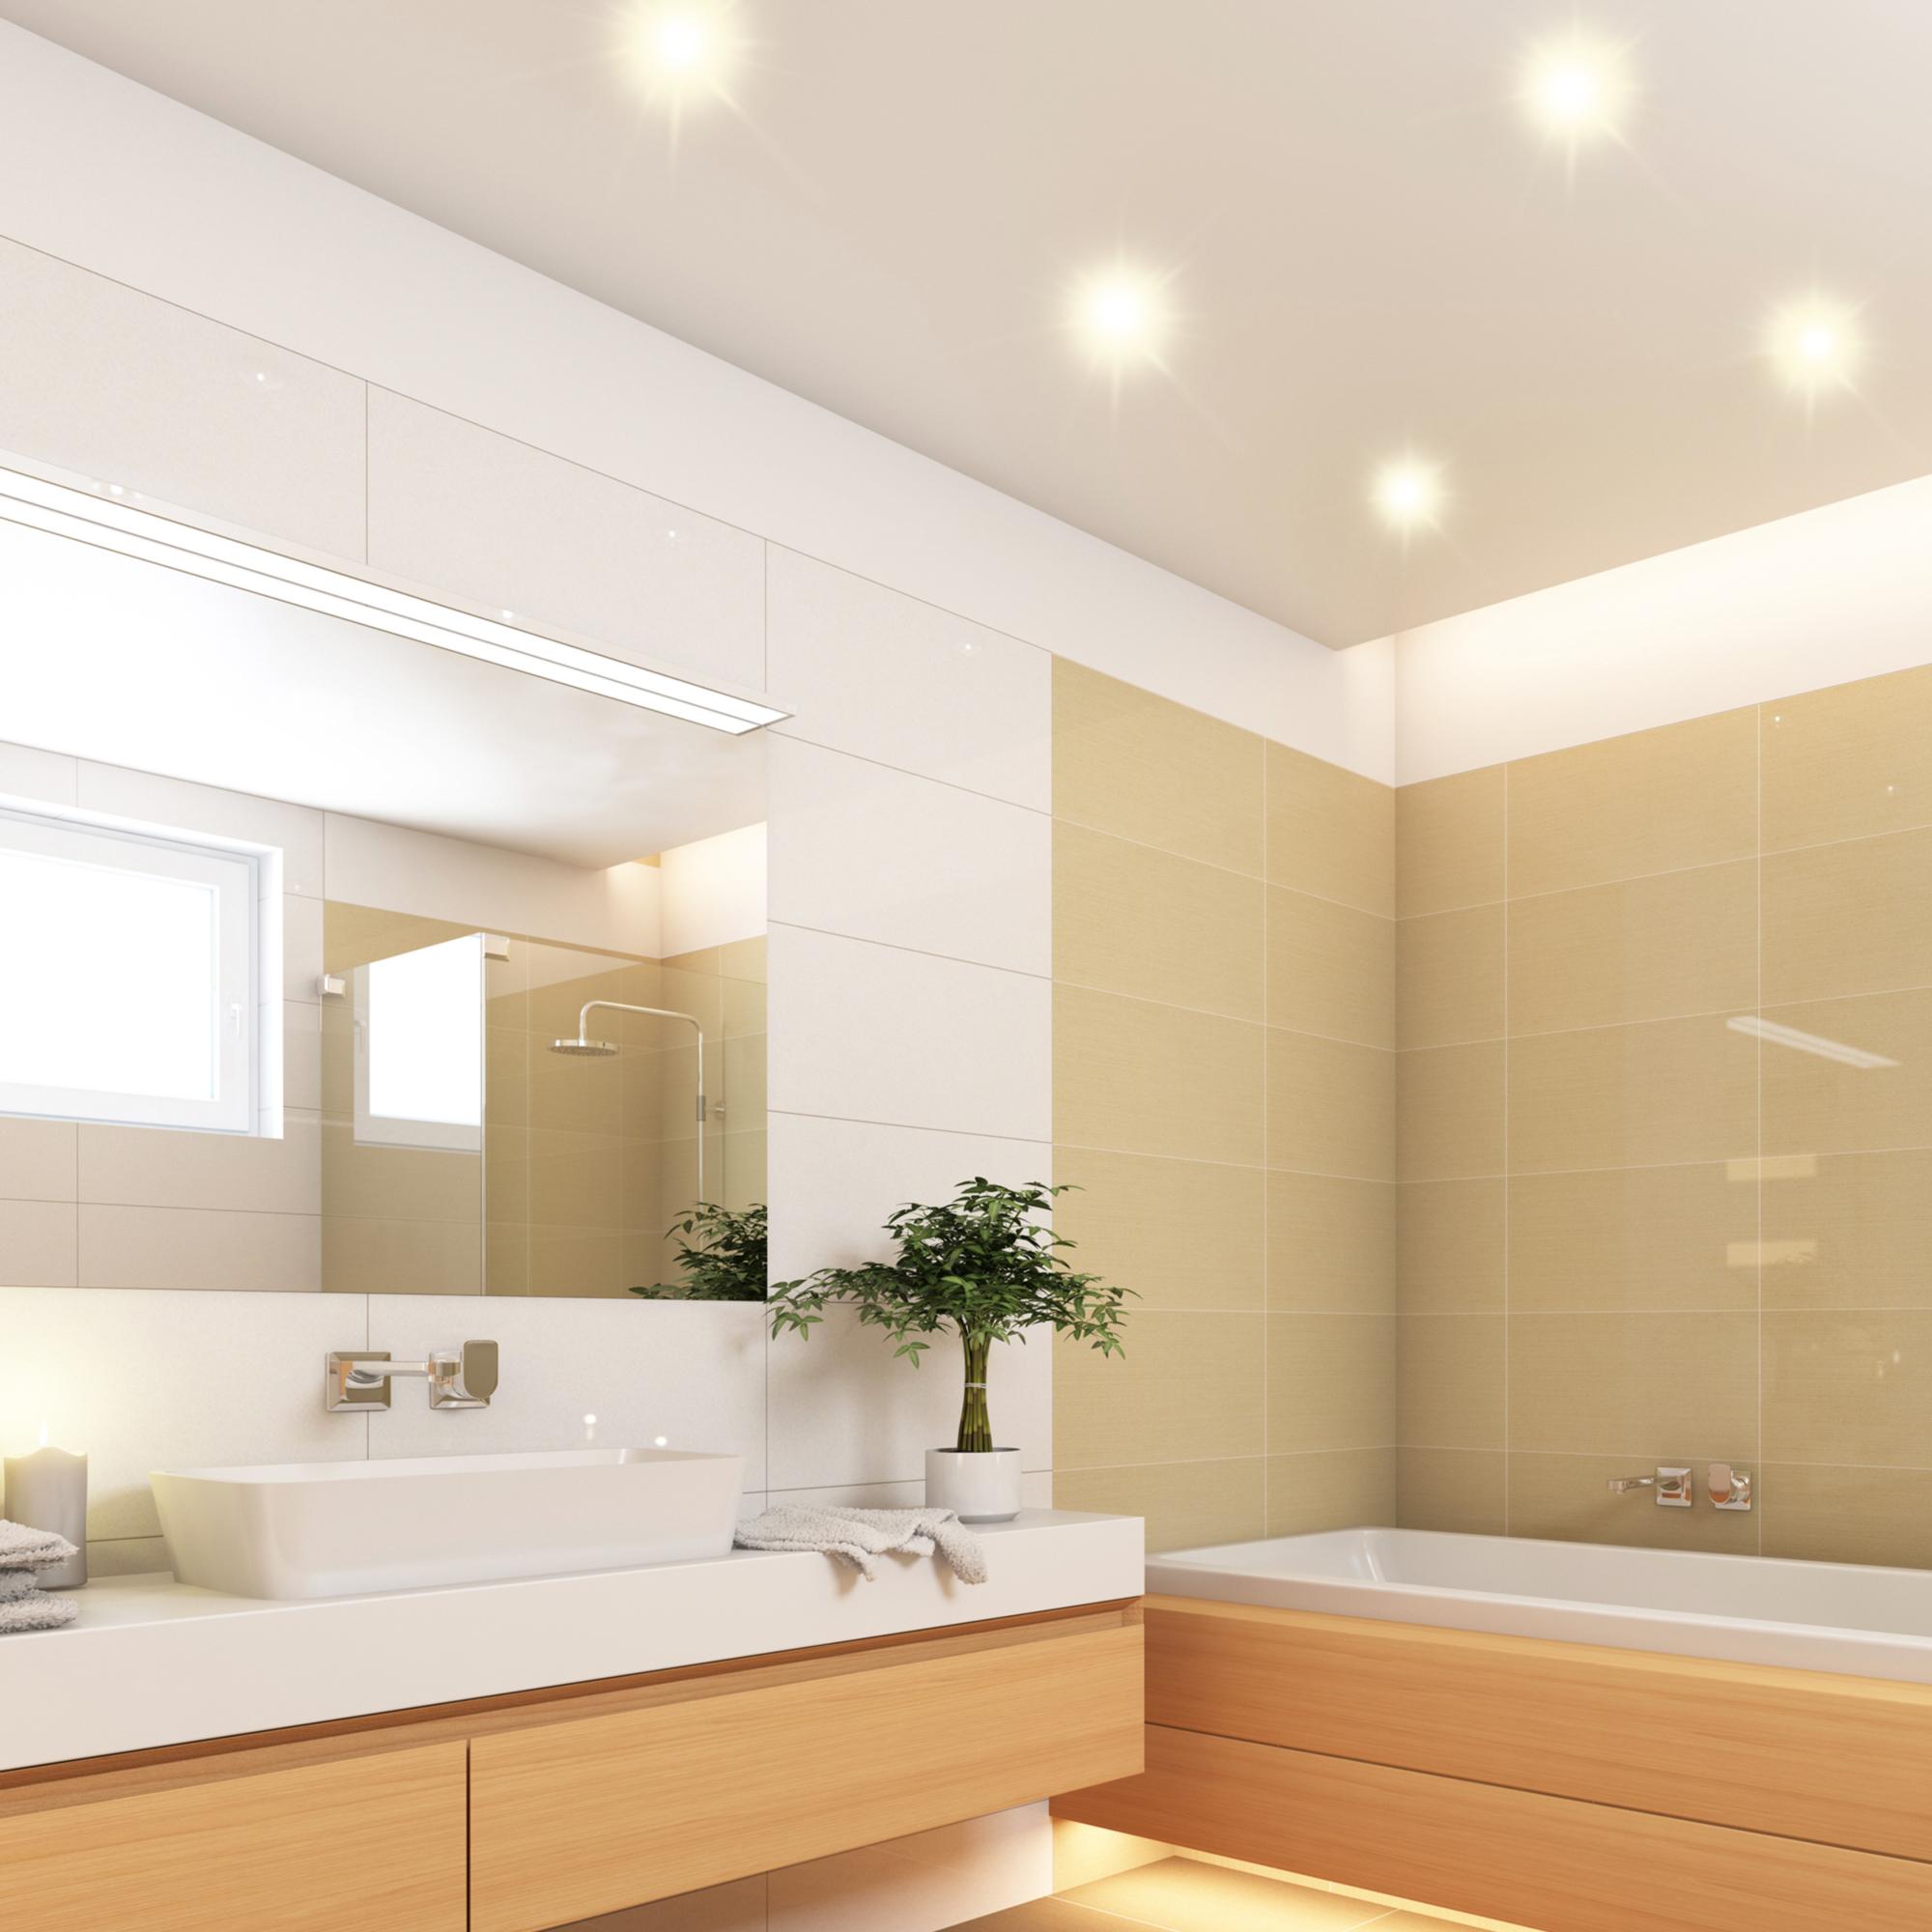 Flacher LED Bad Einbaustrahler RW 20 in weiß & rund IP20 mit LED Modul 20W  warmweiß 2030V